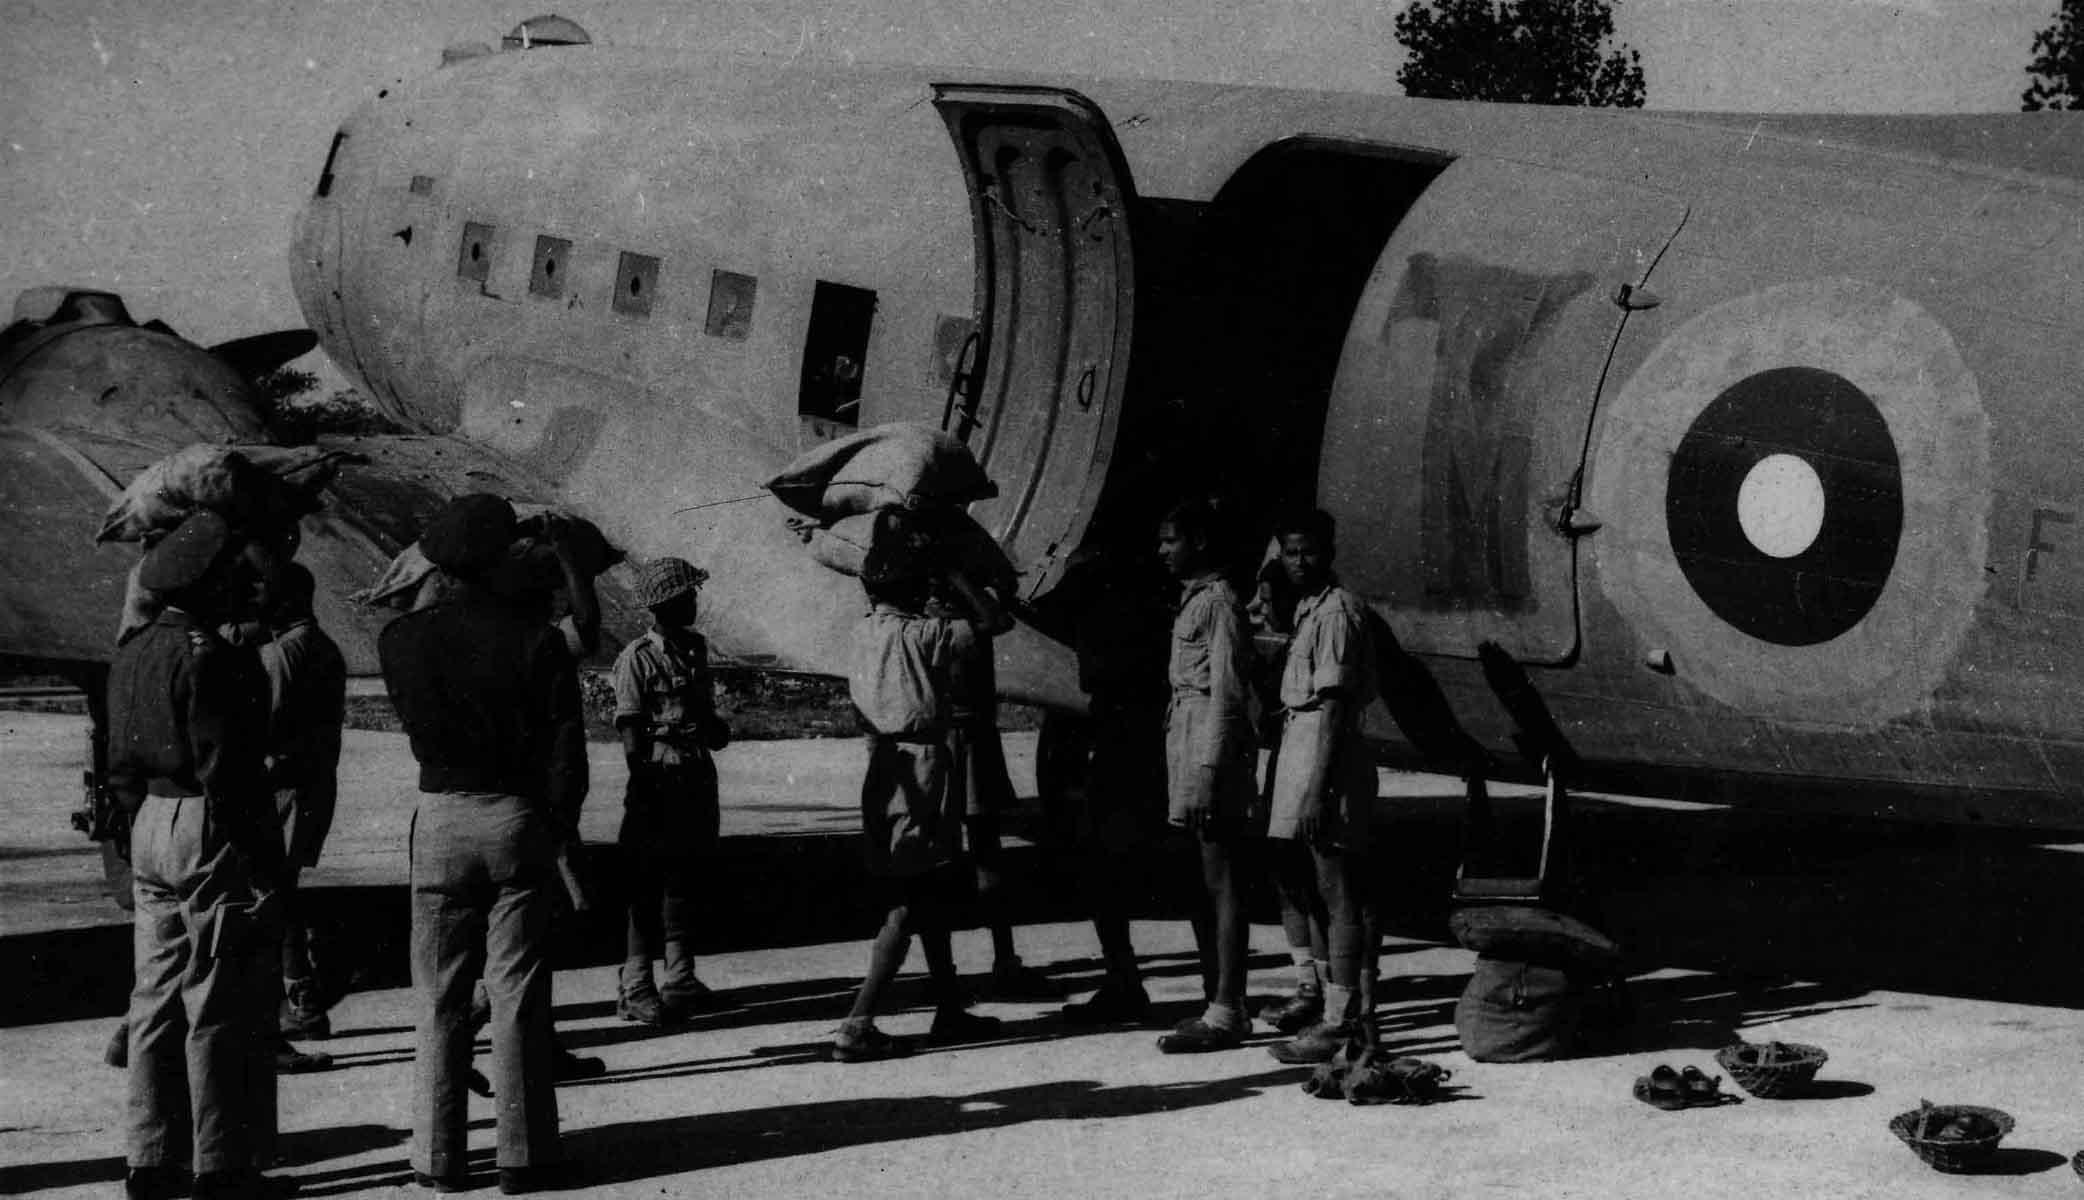 Loading supplies into RAF Douglas Dakota Mk. III, Burma, 10 June 1944 (RAFM PC71/19/608)